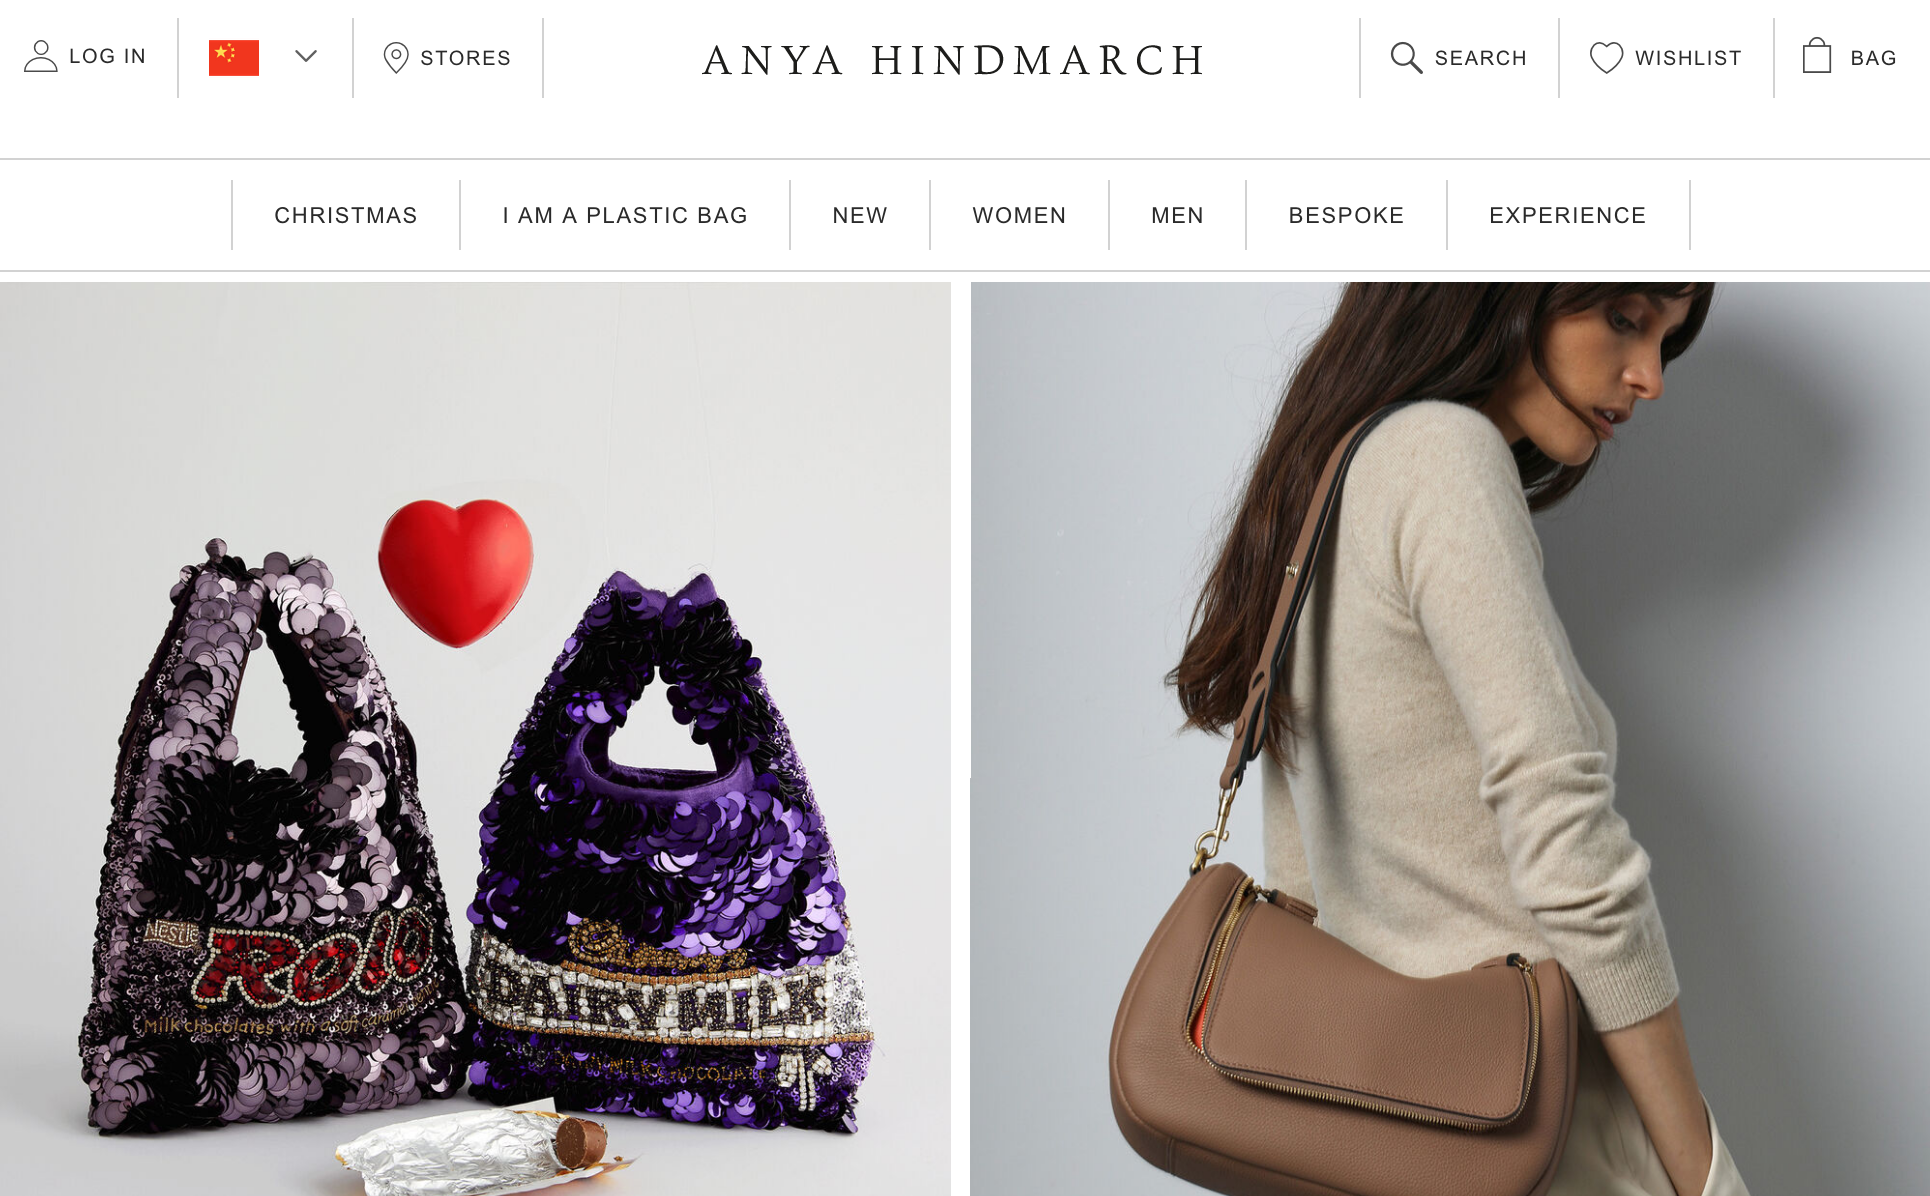 Anya Hindmarch 创始人:幸好去年关了许多店,今年应对疫情才比较从容